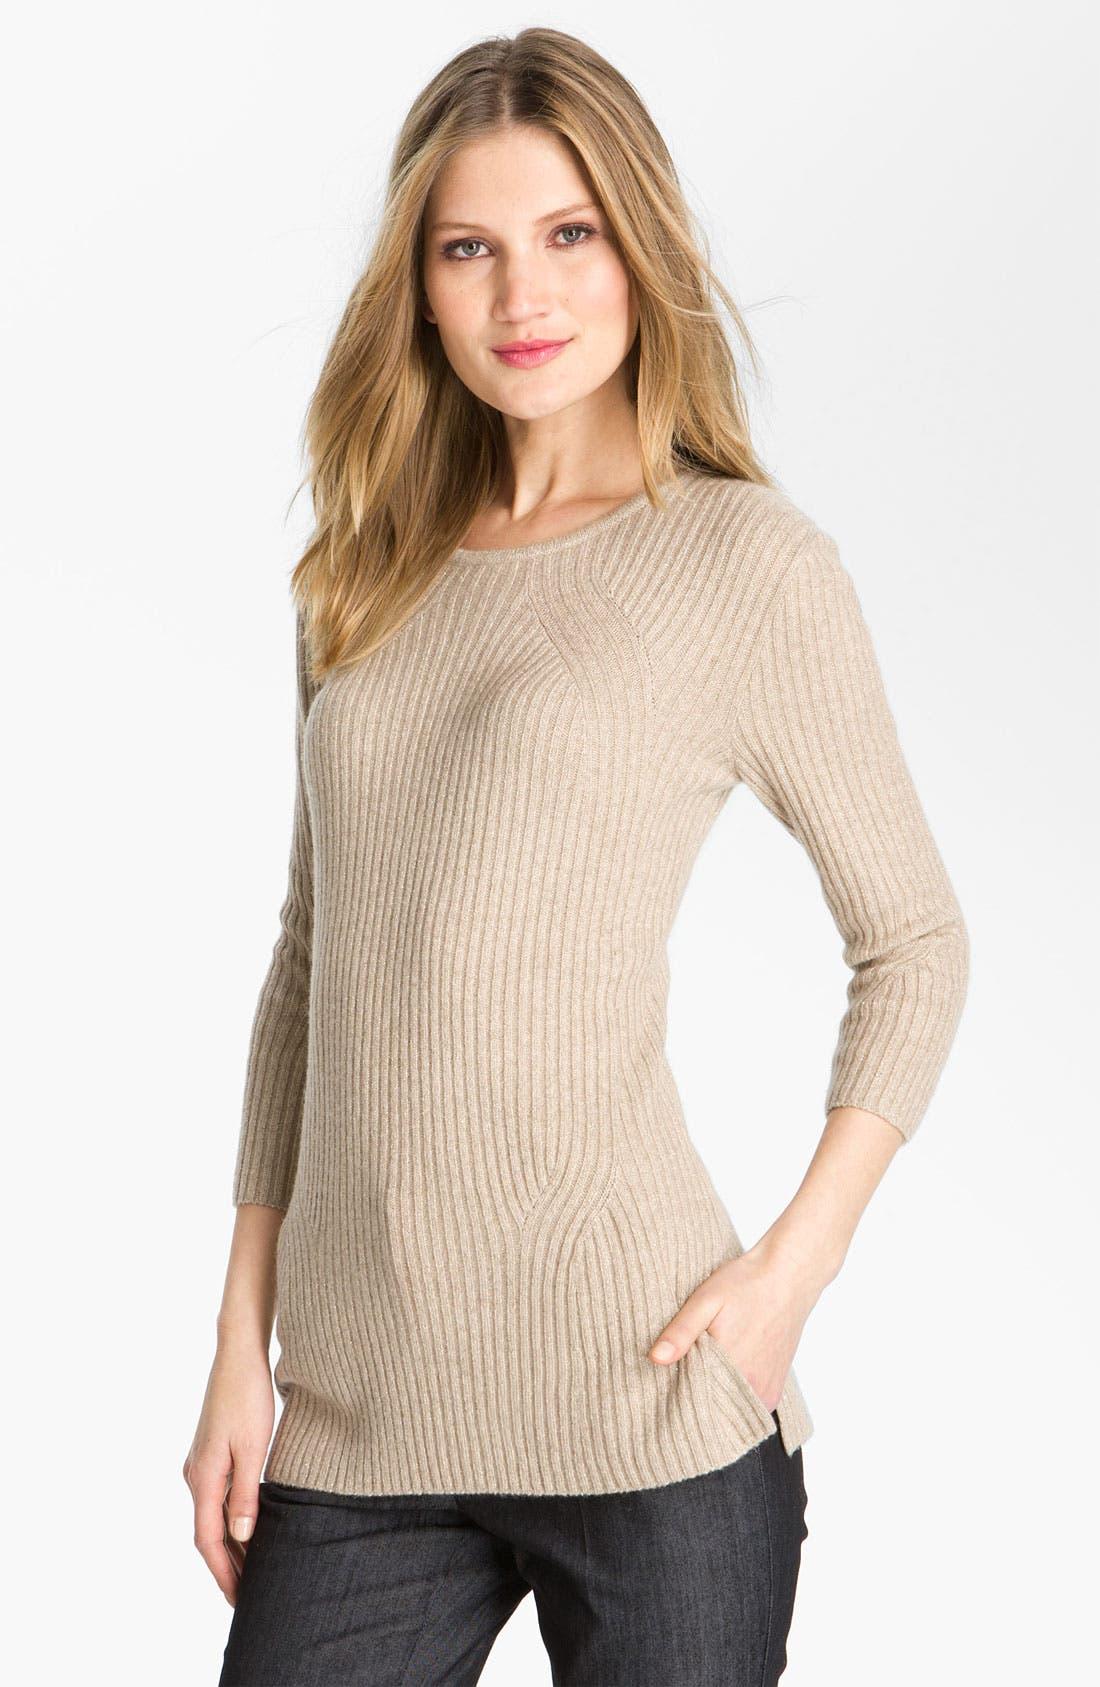 Alternate Image 1 Selected - St. John Yellow Label Sparkle Rib Knit Sweater